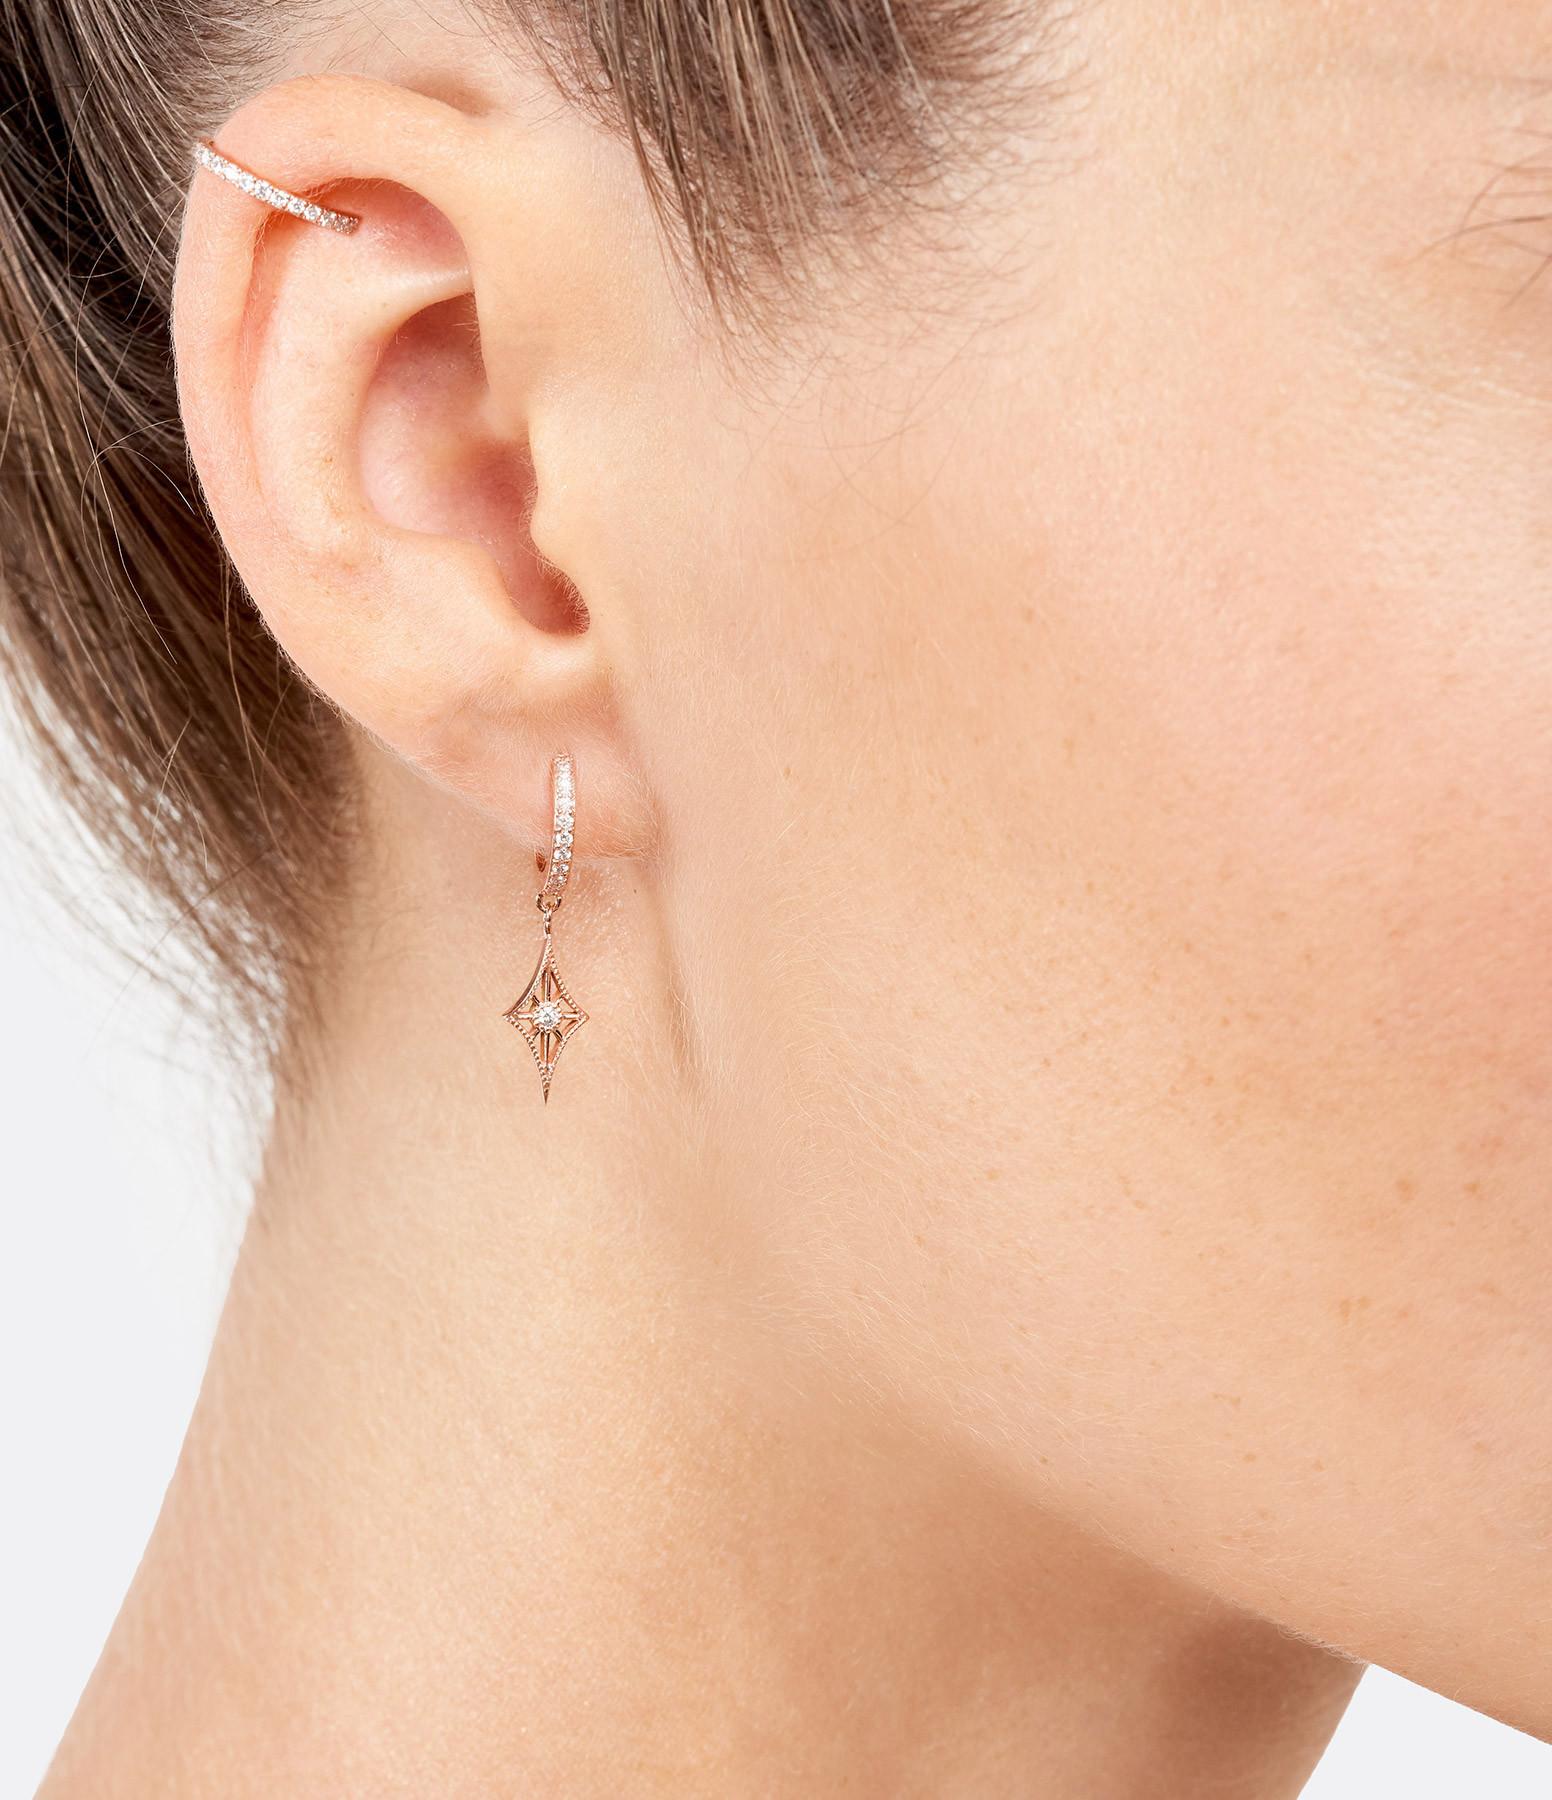 NAVA JOAILLERIE - Boucle d'oreille Cheyenne Losange Diamants Or Rose